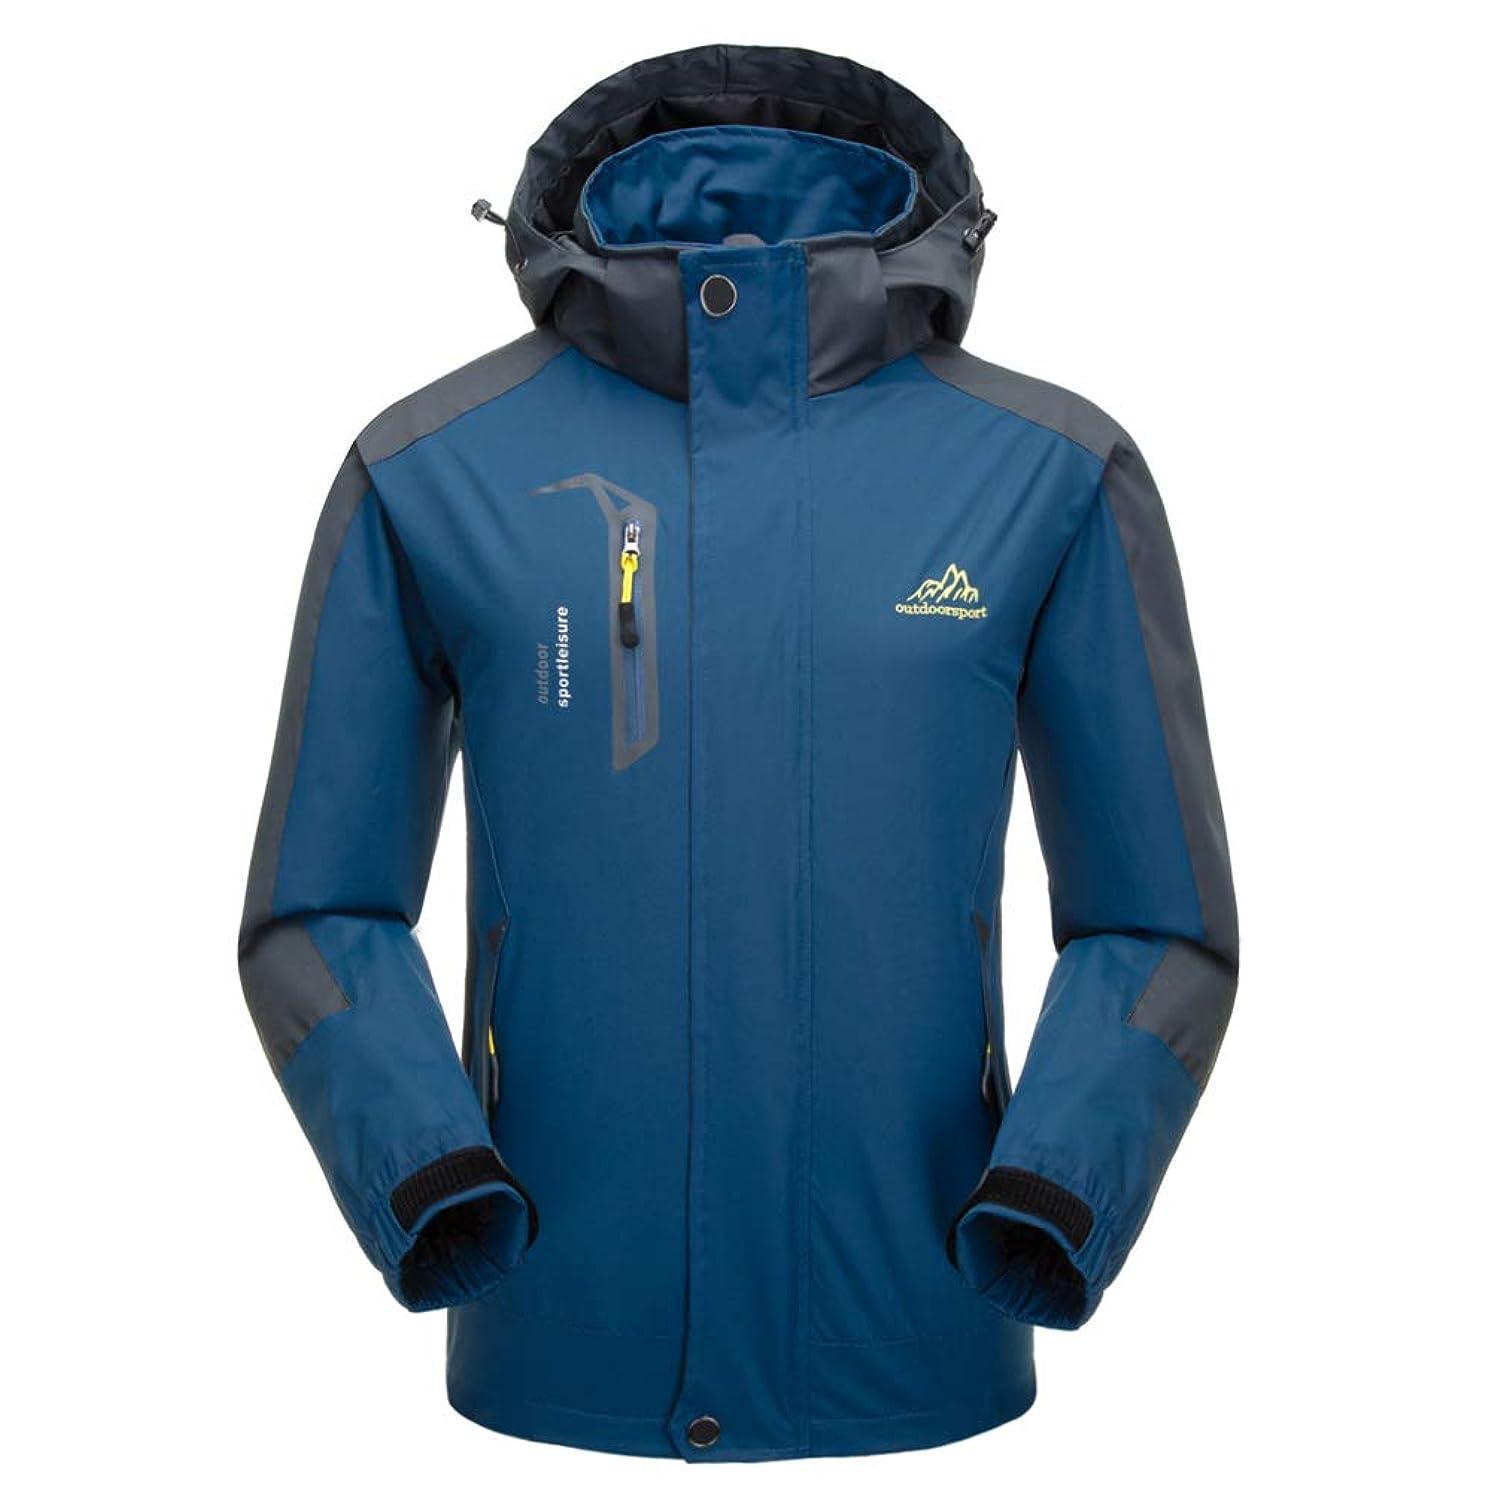 Farvalue Men's Rain Coat Spring Lightweight Casual Waterproof Windbreaker Breathable Jacket with Removable Hood